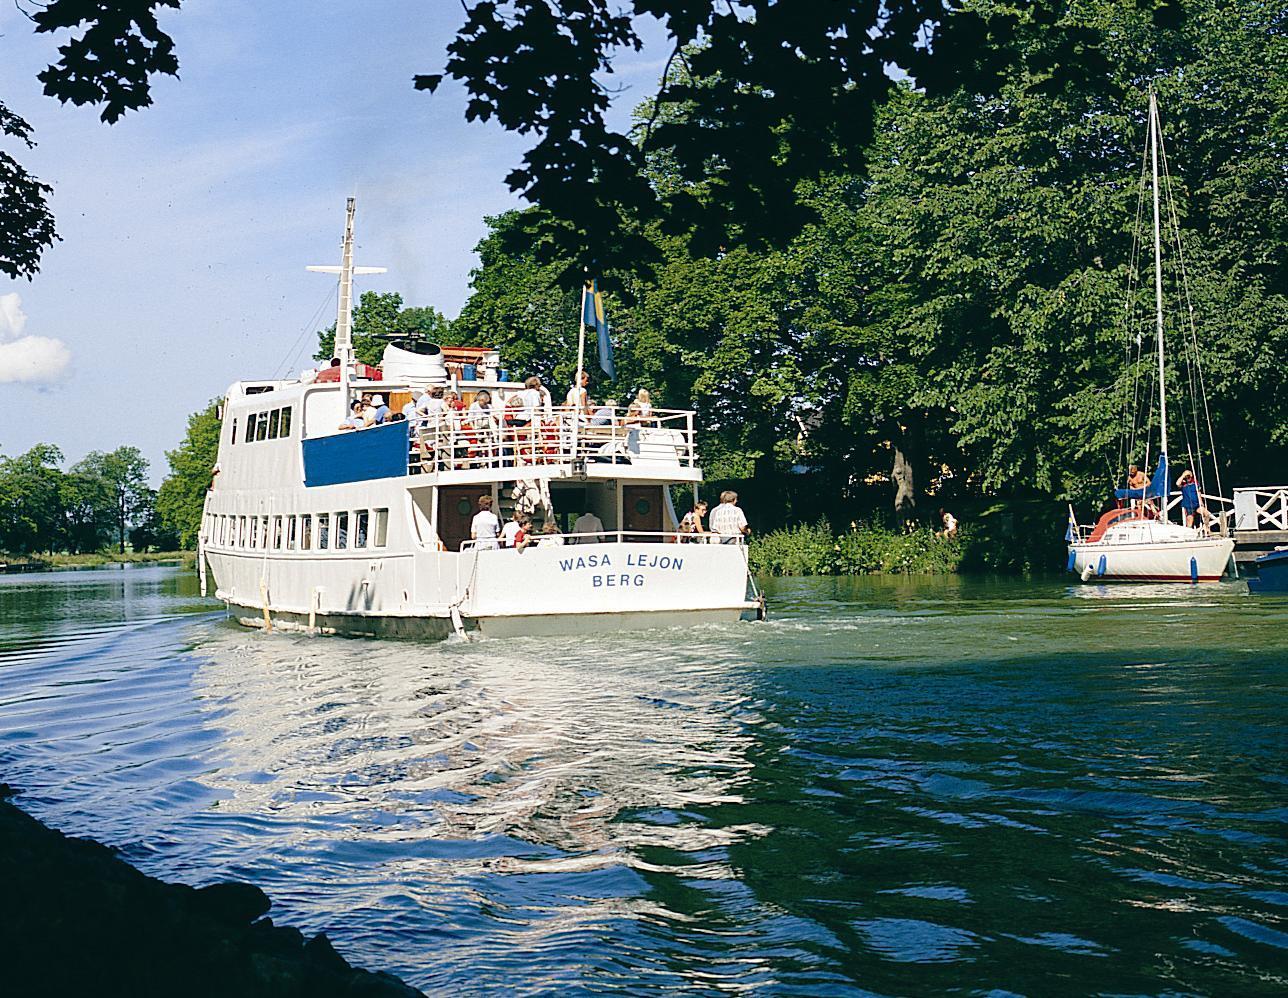 Stor vit passagerarbåt har passerat i kanalen.